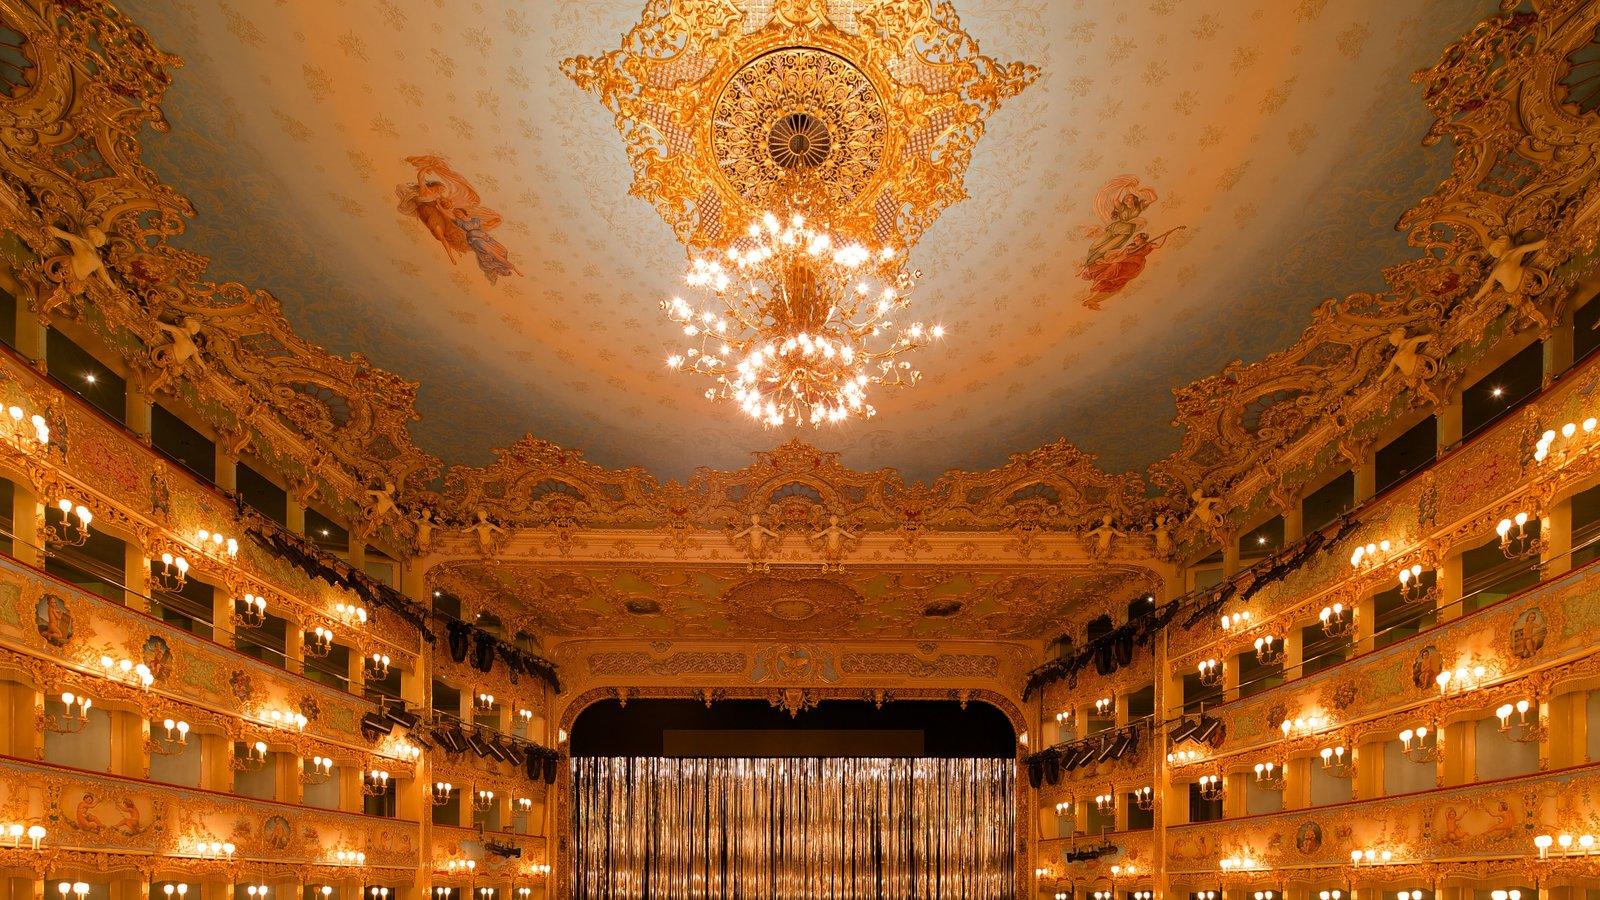 La Fenice Opera House showing theatre scenes, heritage architecture and interior views